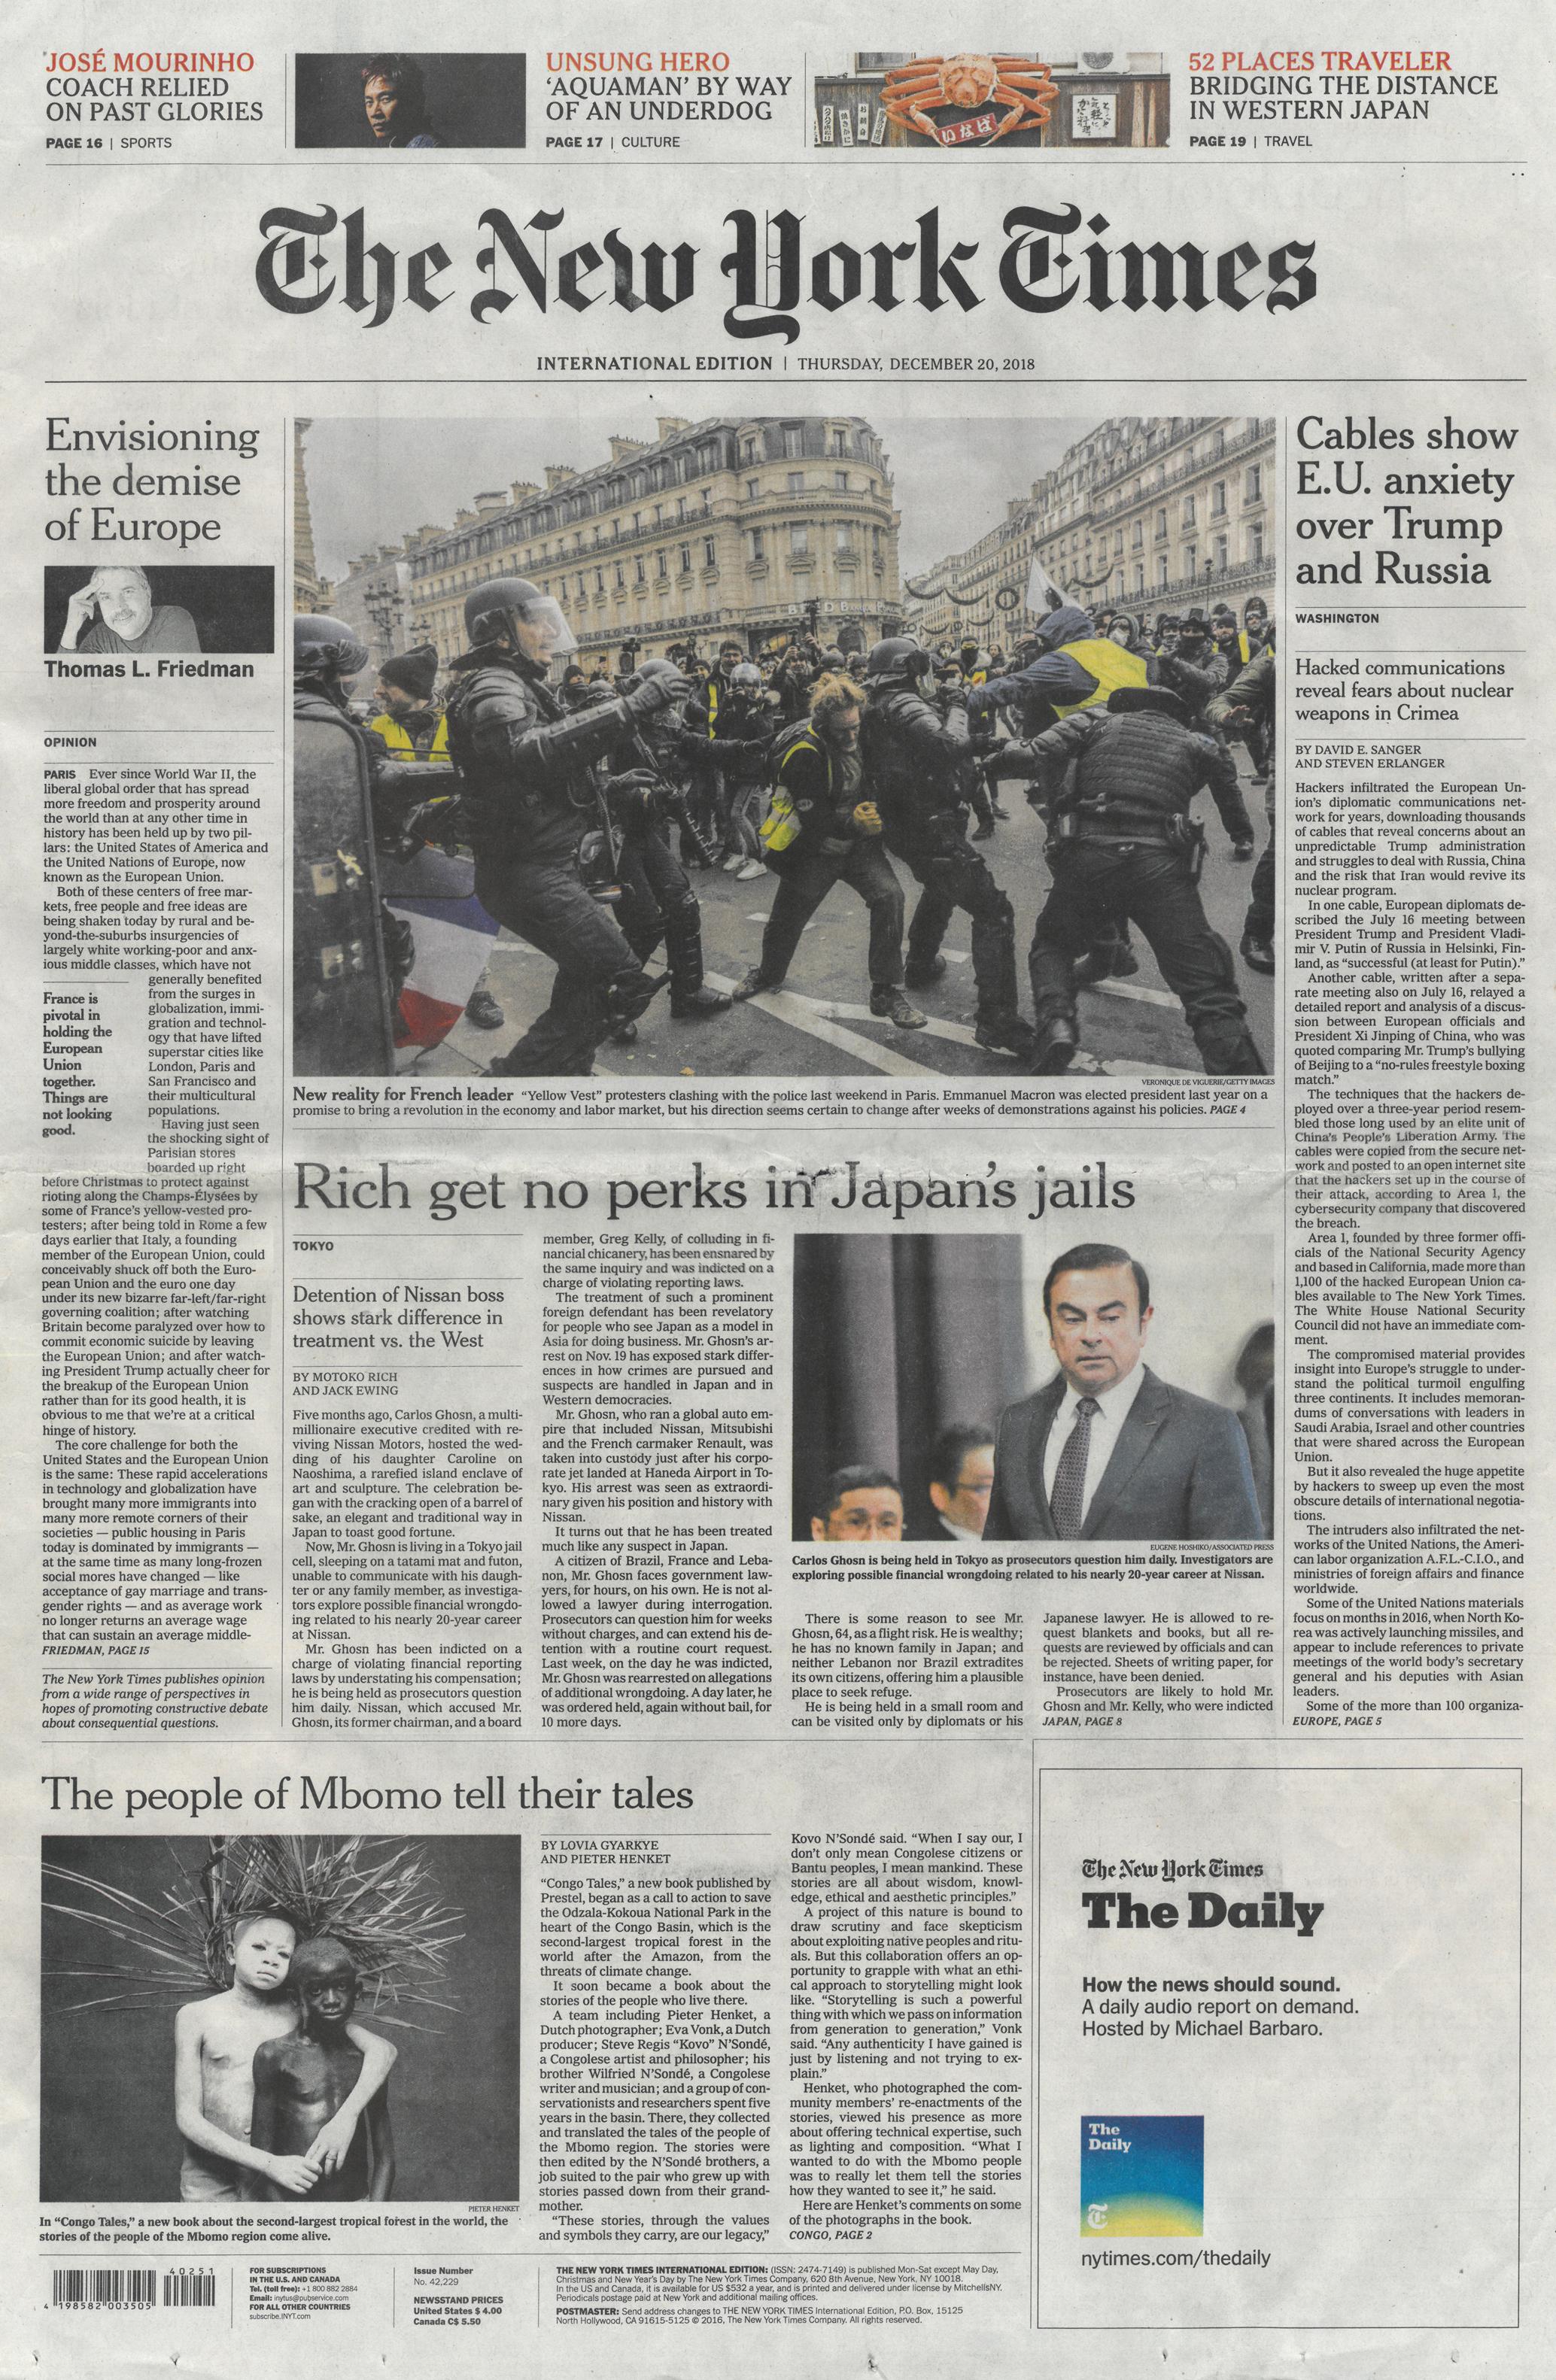 Nutter-New-York-Times-Congo-Stories-Dec-2018-flatb-1.jpg